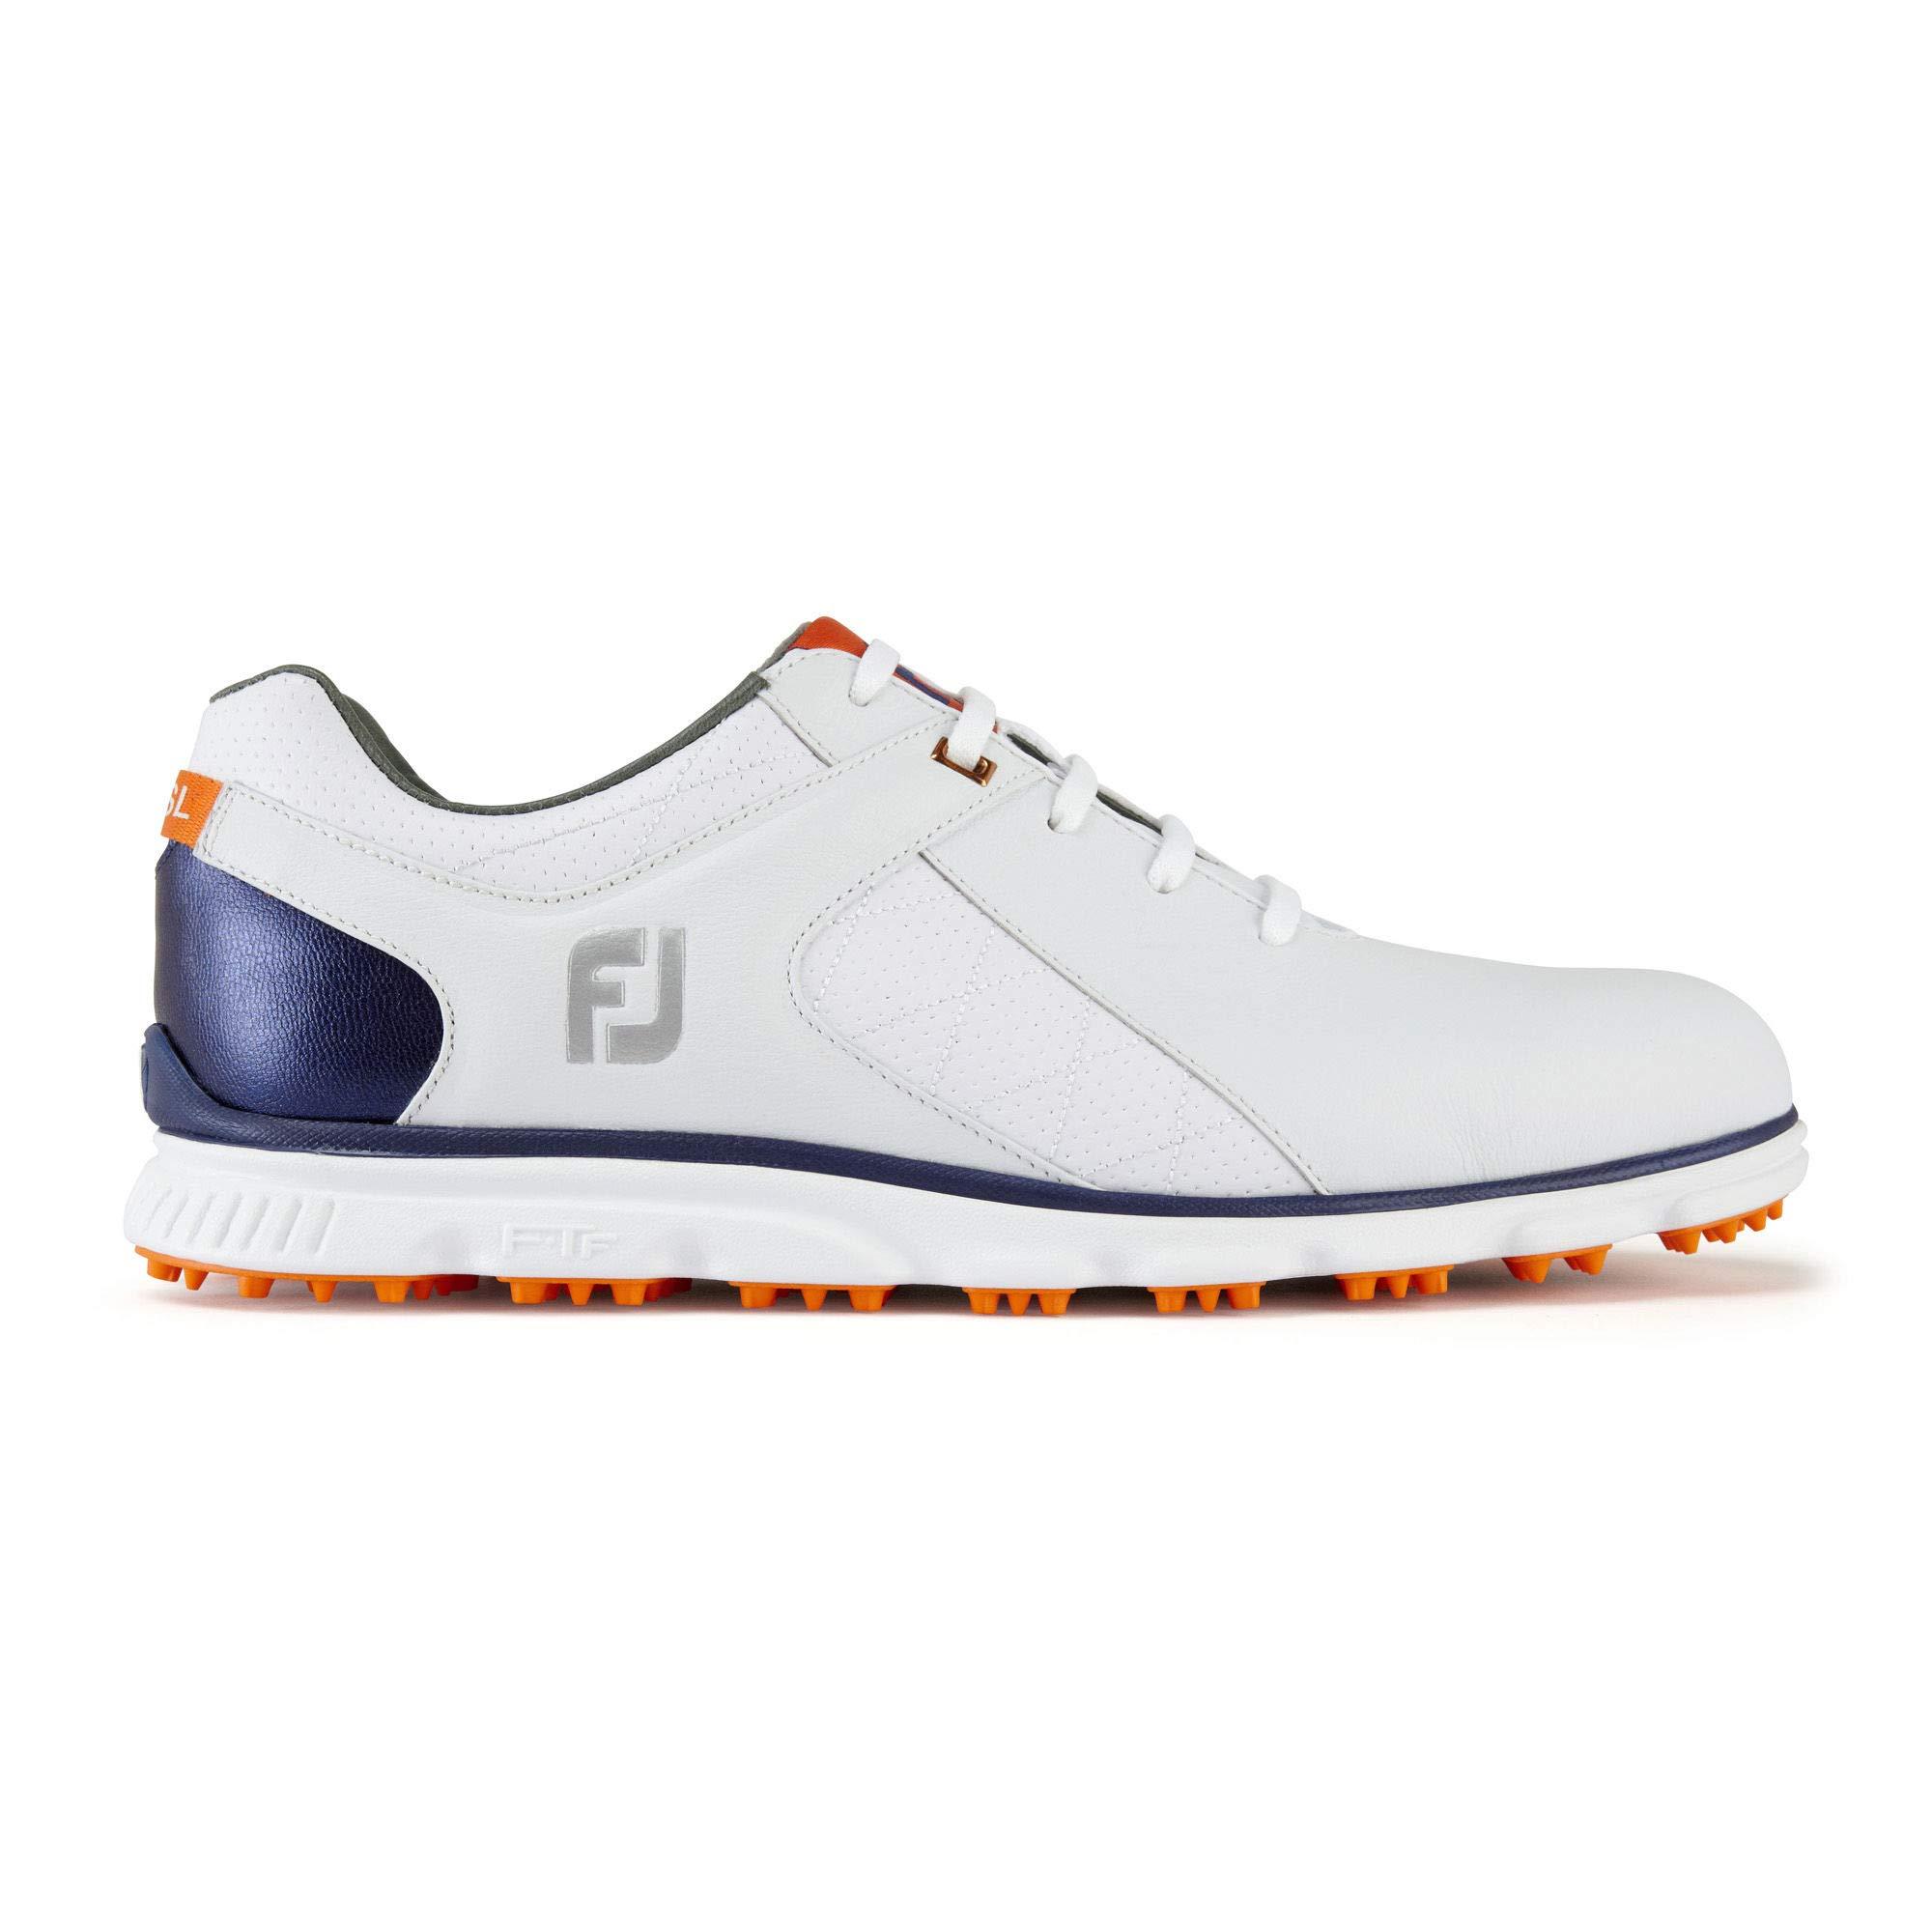 FootJoy Men's Pro/SL-Previous Season Style Golf Shoes White 8 M Navy/Orange, US